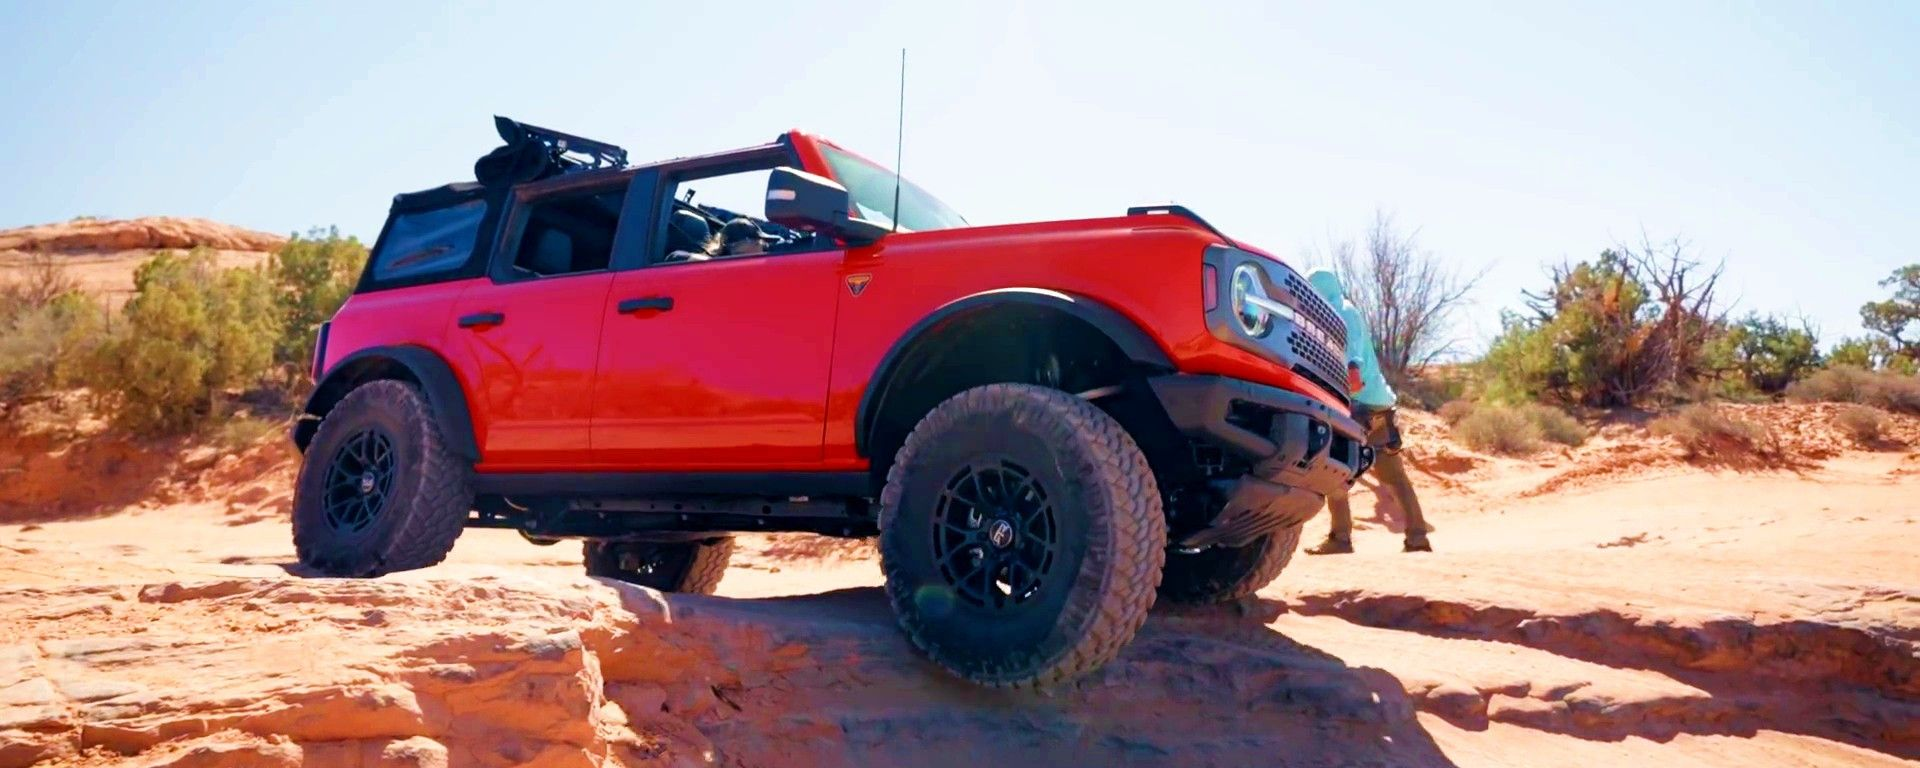 Ford Bronco 2021 allo Hell's Revenge 4x4 Trail